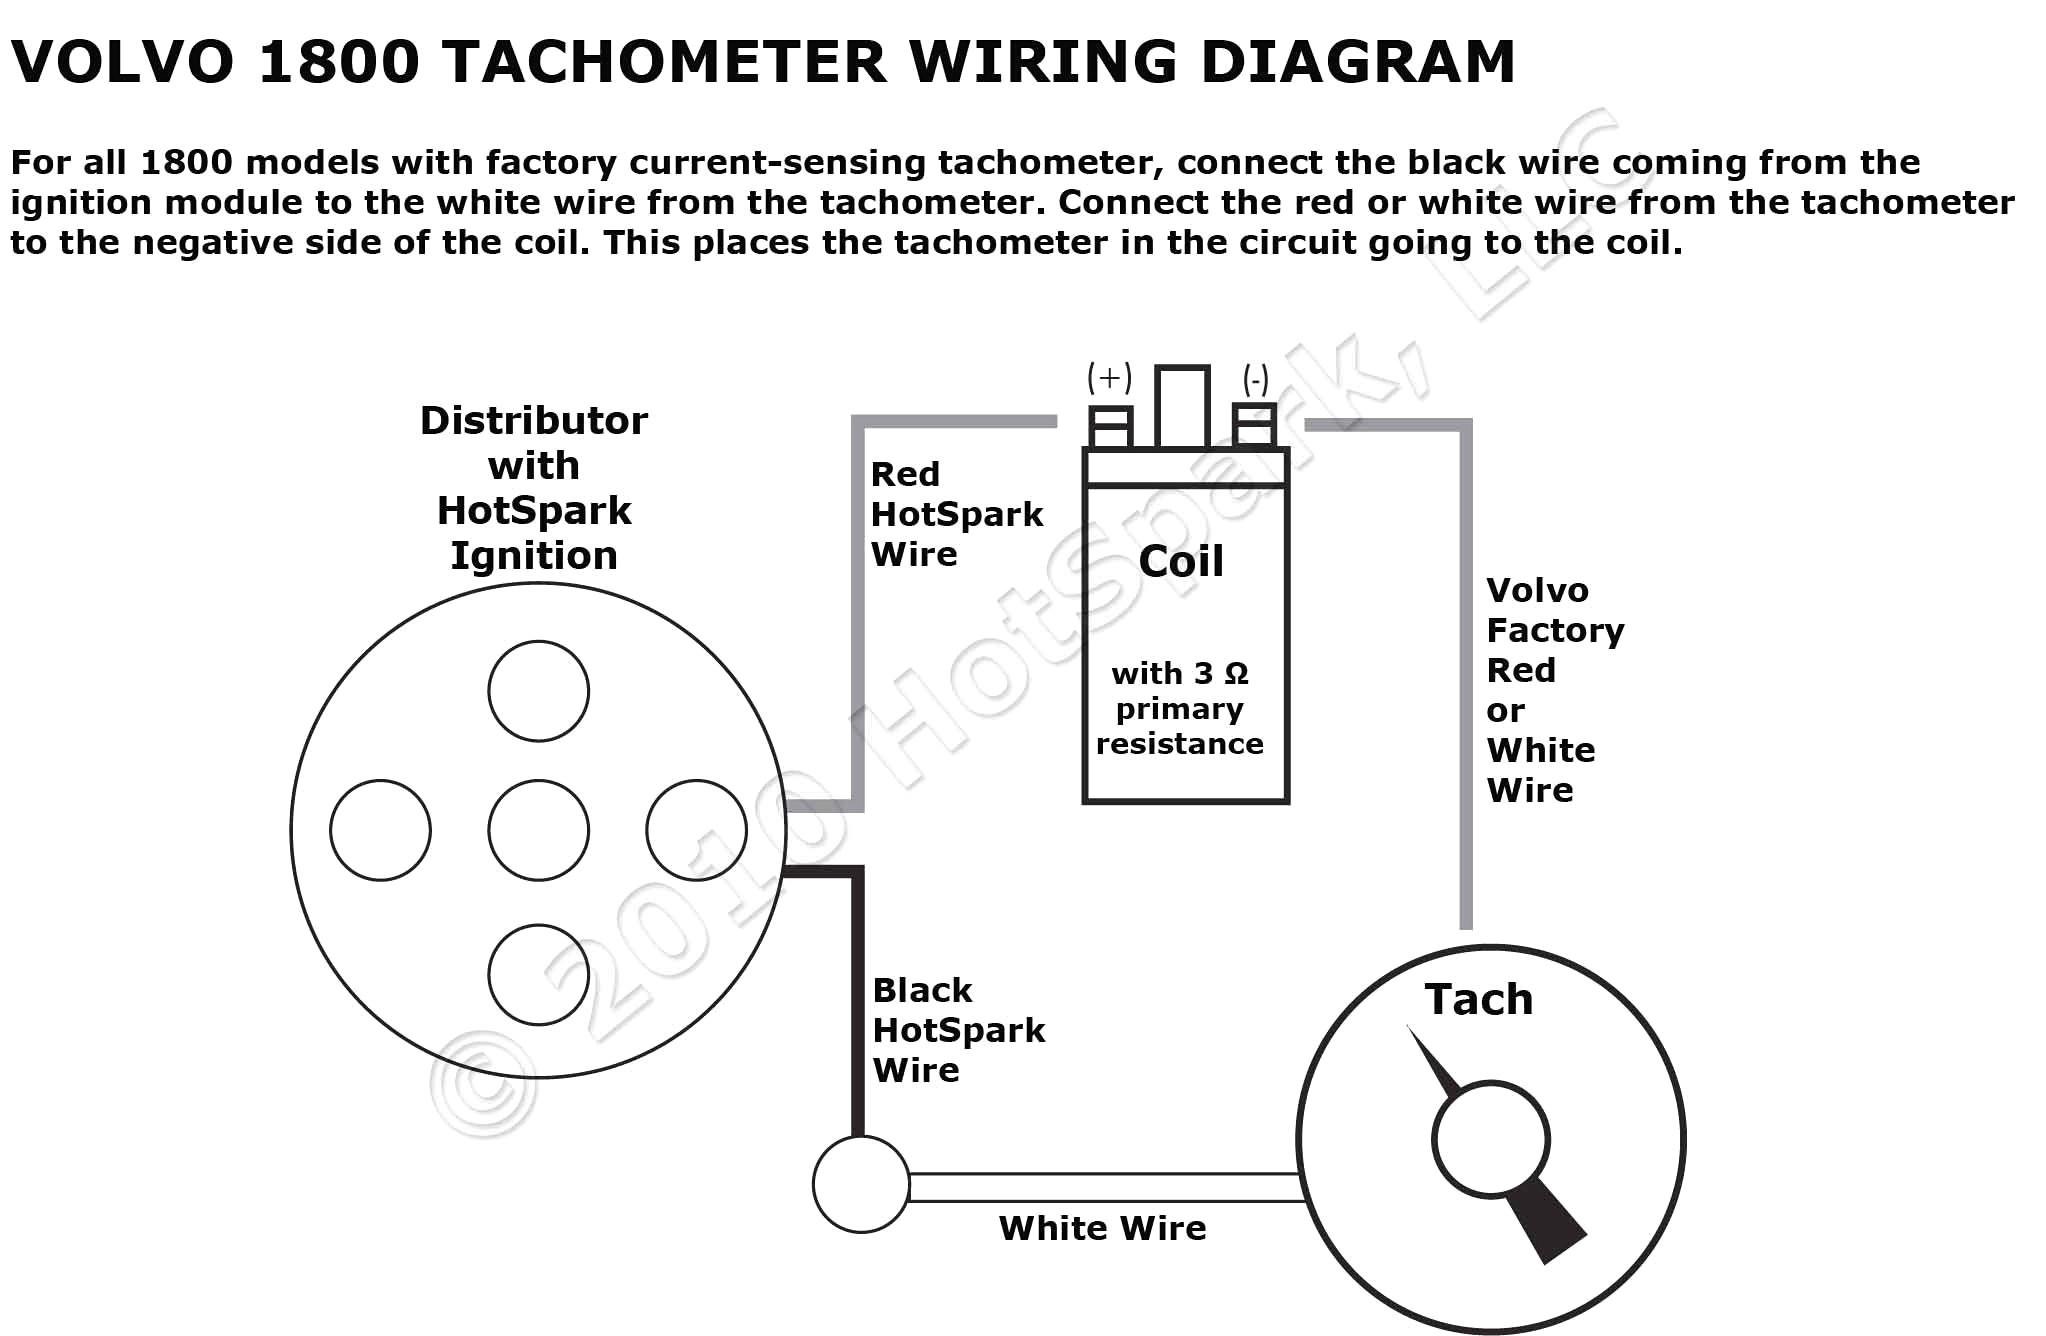 Sport Comp Tach Wiring Diagram To Msd Ing - Hella Light Wiring Diagram -  diagramford.losdol2.jeanjaures37.fr   Sport Comp Tach Wiring Diagram To Msd Ing      Wiring Diagram Resource